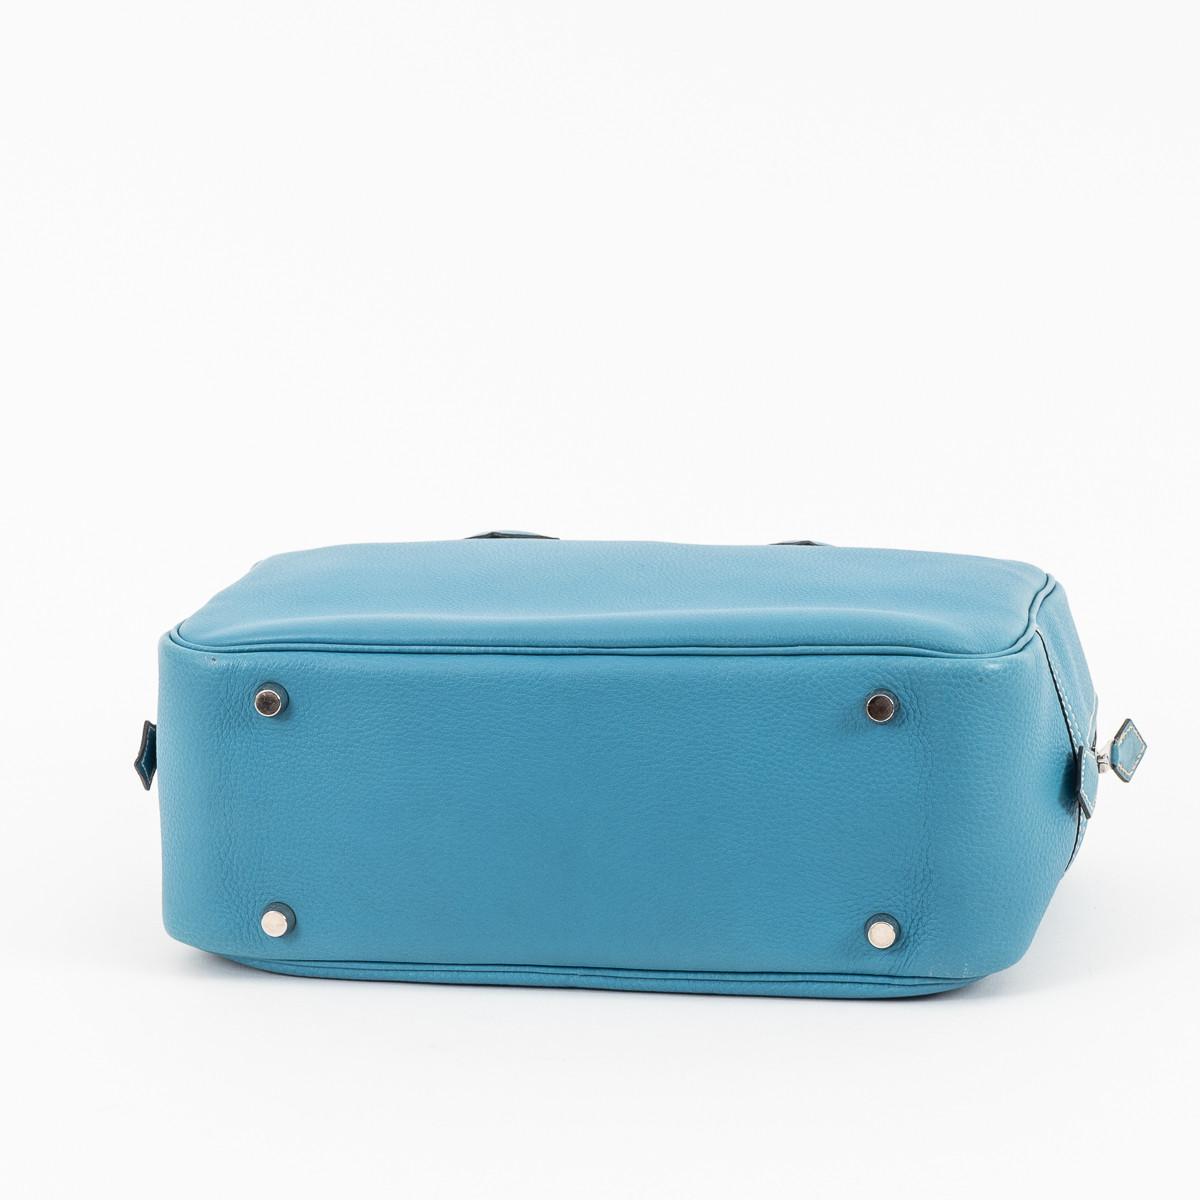 3e812795bc Sac à main Plume moyen modèle en cuir epsom bleu-jean. 6 image(s). Hermès